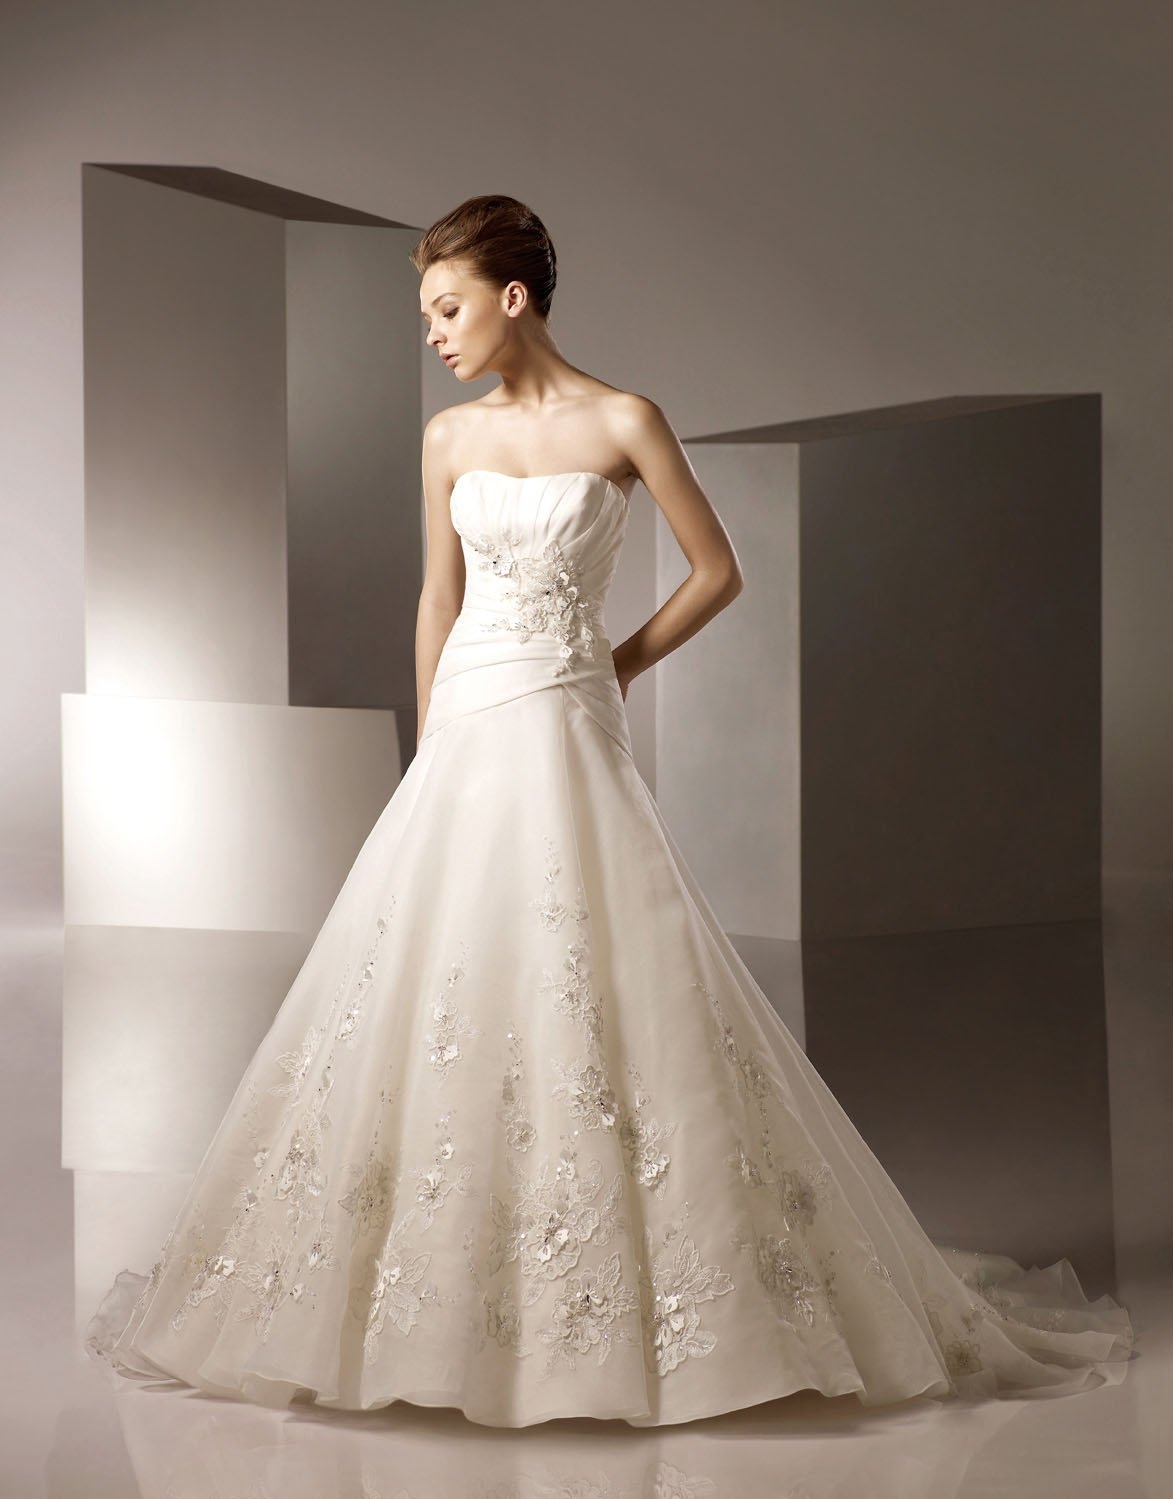 A-line Scoop Neckline Appliqued Beading Organza Wedding Dress Bridal Gown